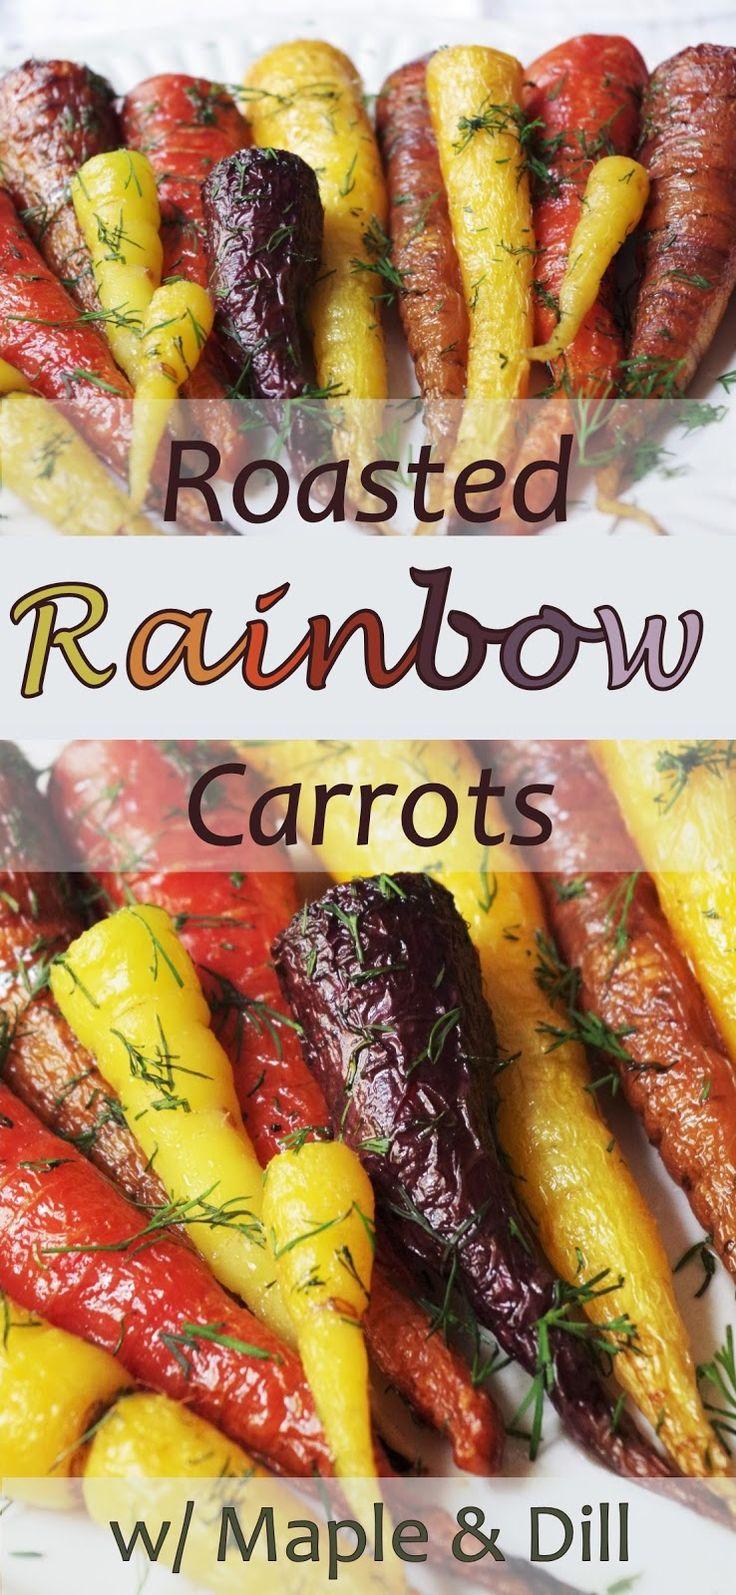 Roasted Rainbow Carrots w/ Maple & Dill |Euphoric Vegan